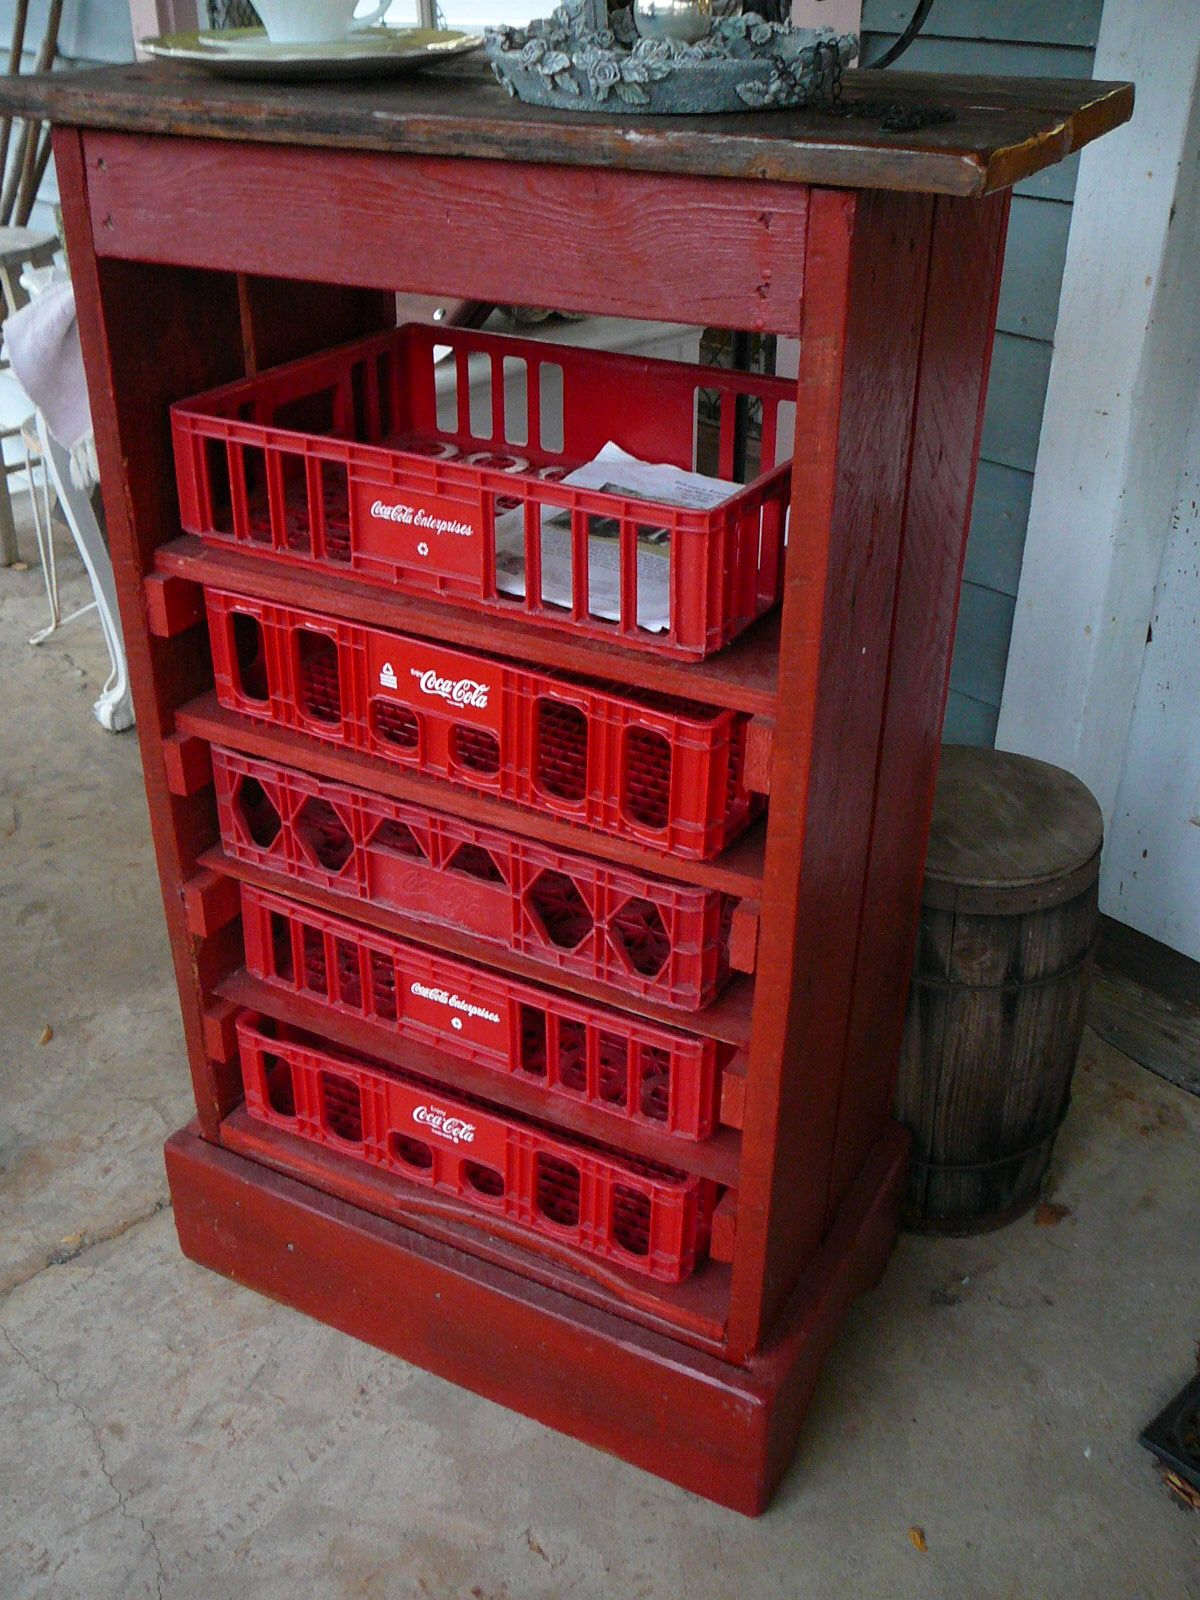 Solid Wood W Plastic Coke Crates Coke Crate Ideas Crates